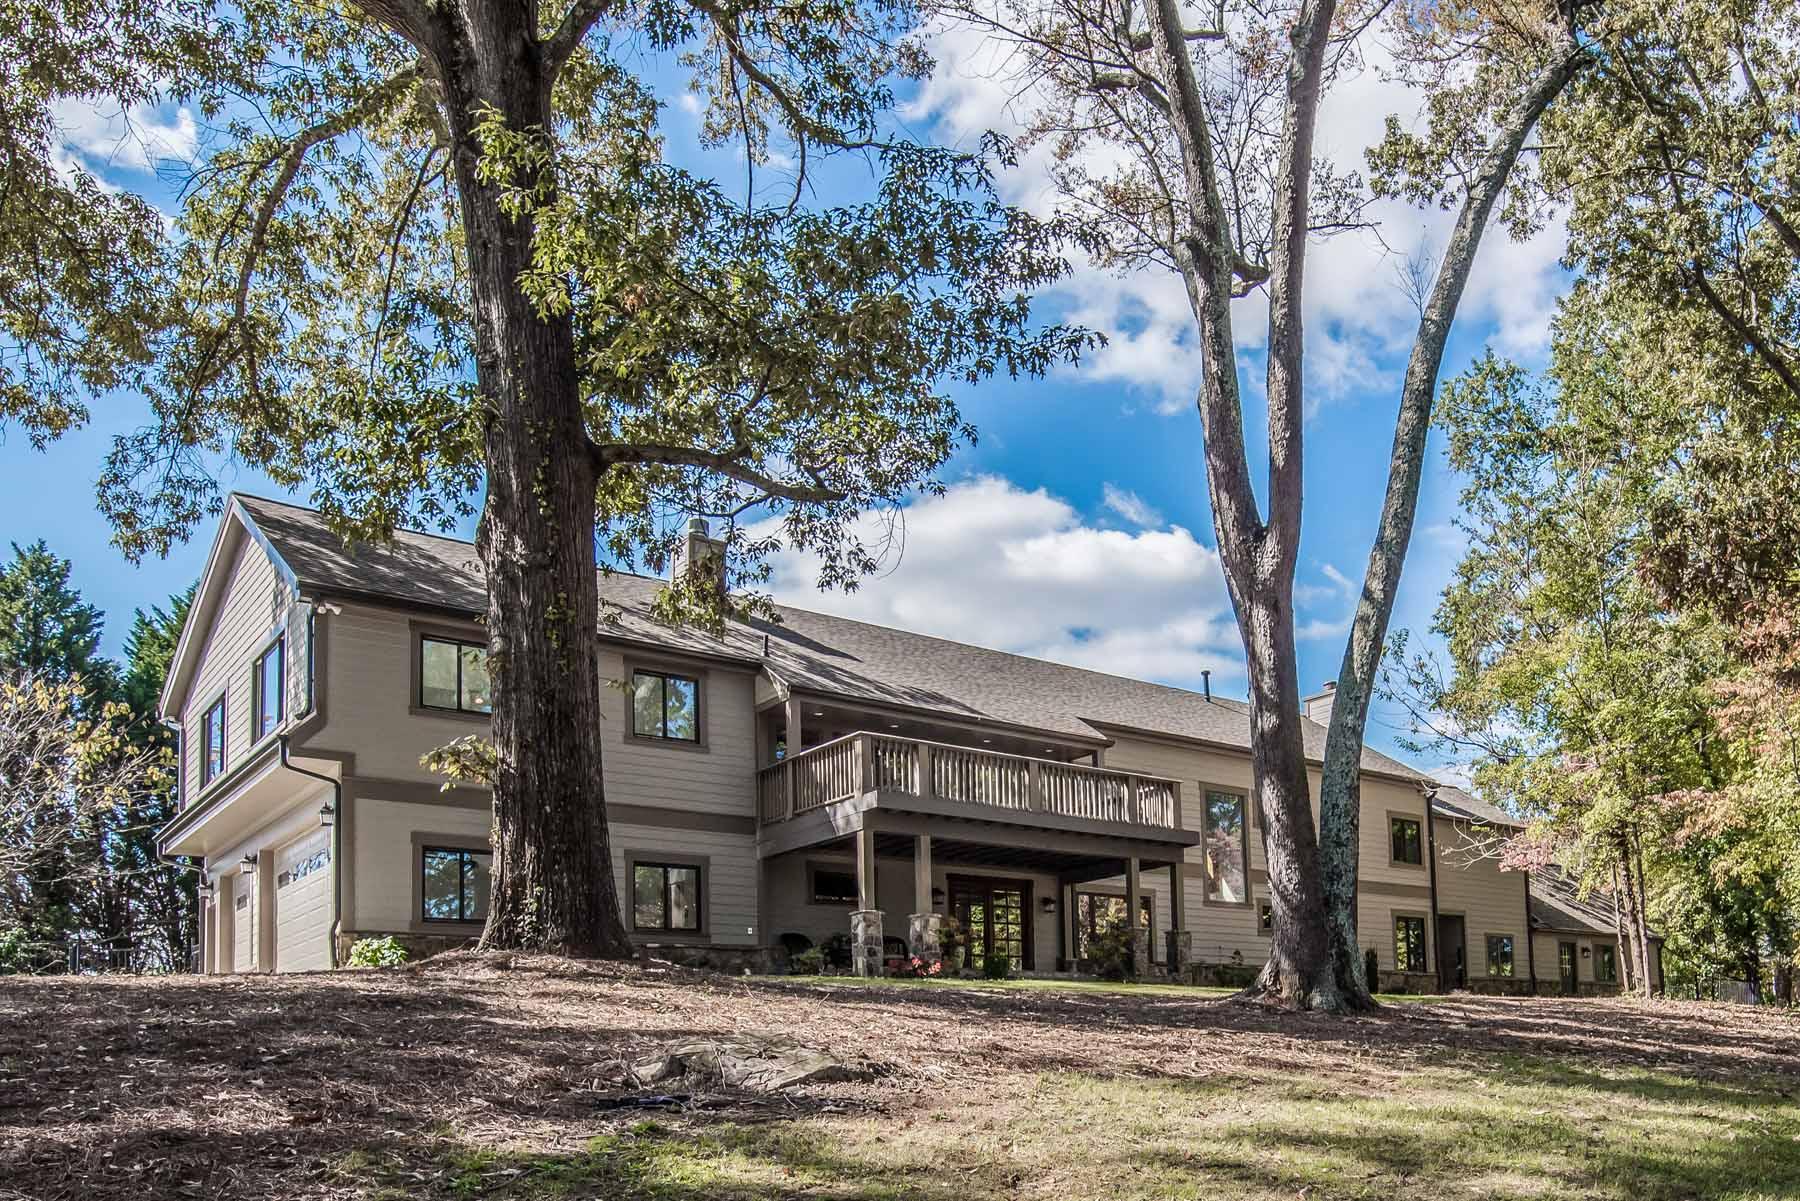 独户住宅 为 销售 在 Masterful Renovation - Backs to Golf Course 9415 Riverclub Parkway Johns Creek, 乔治亚州 30097 美国